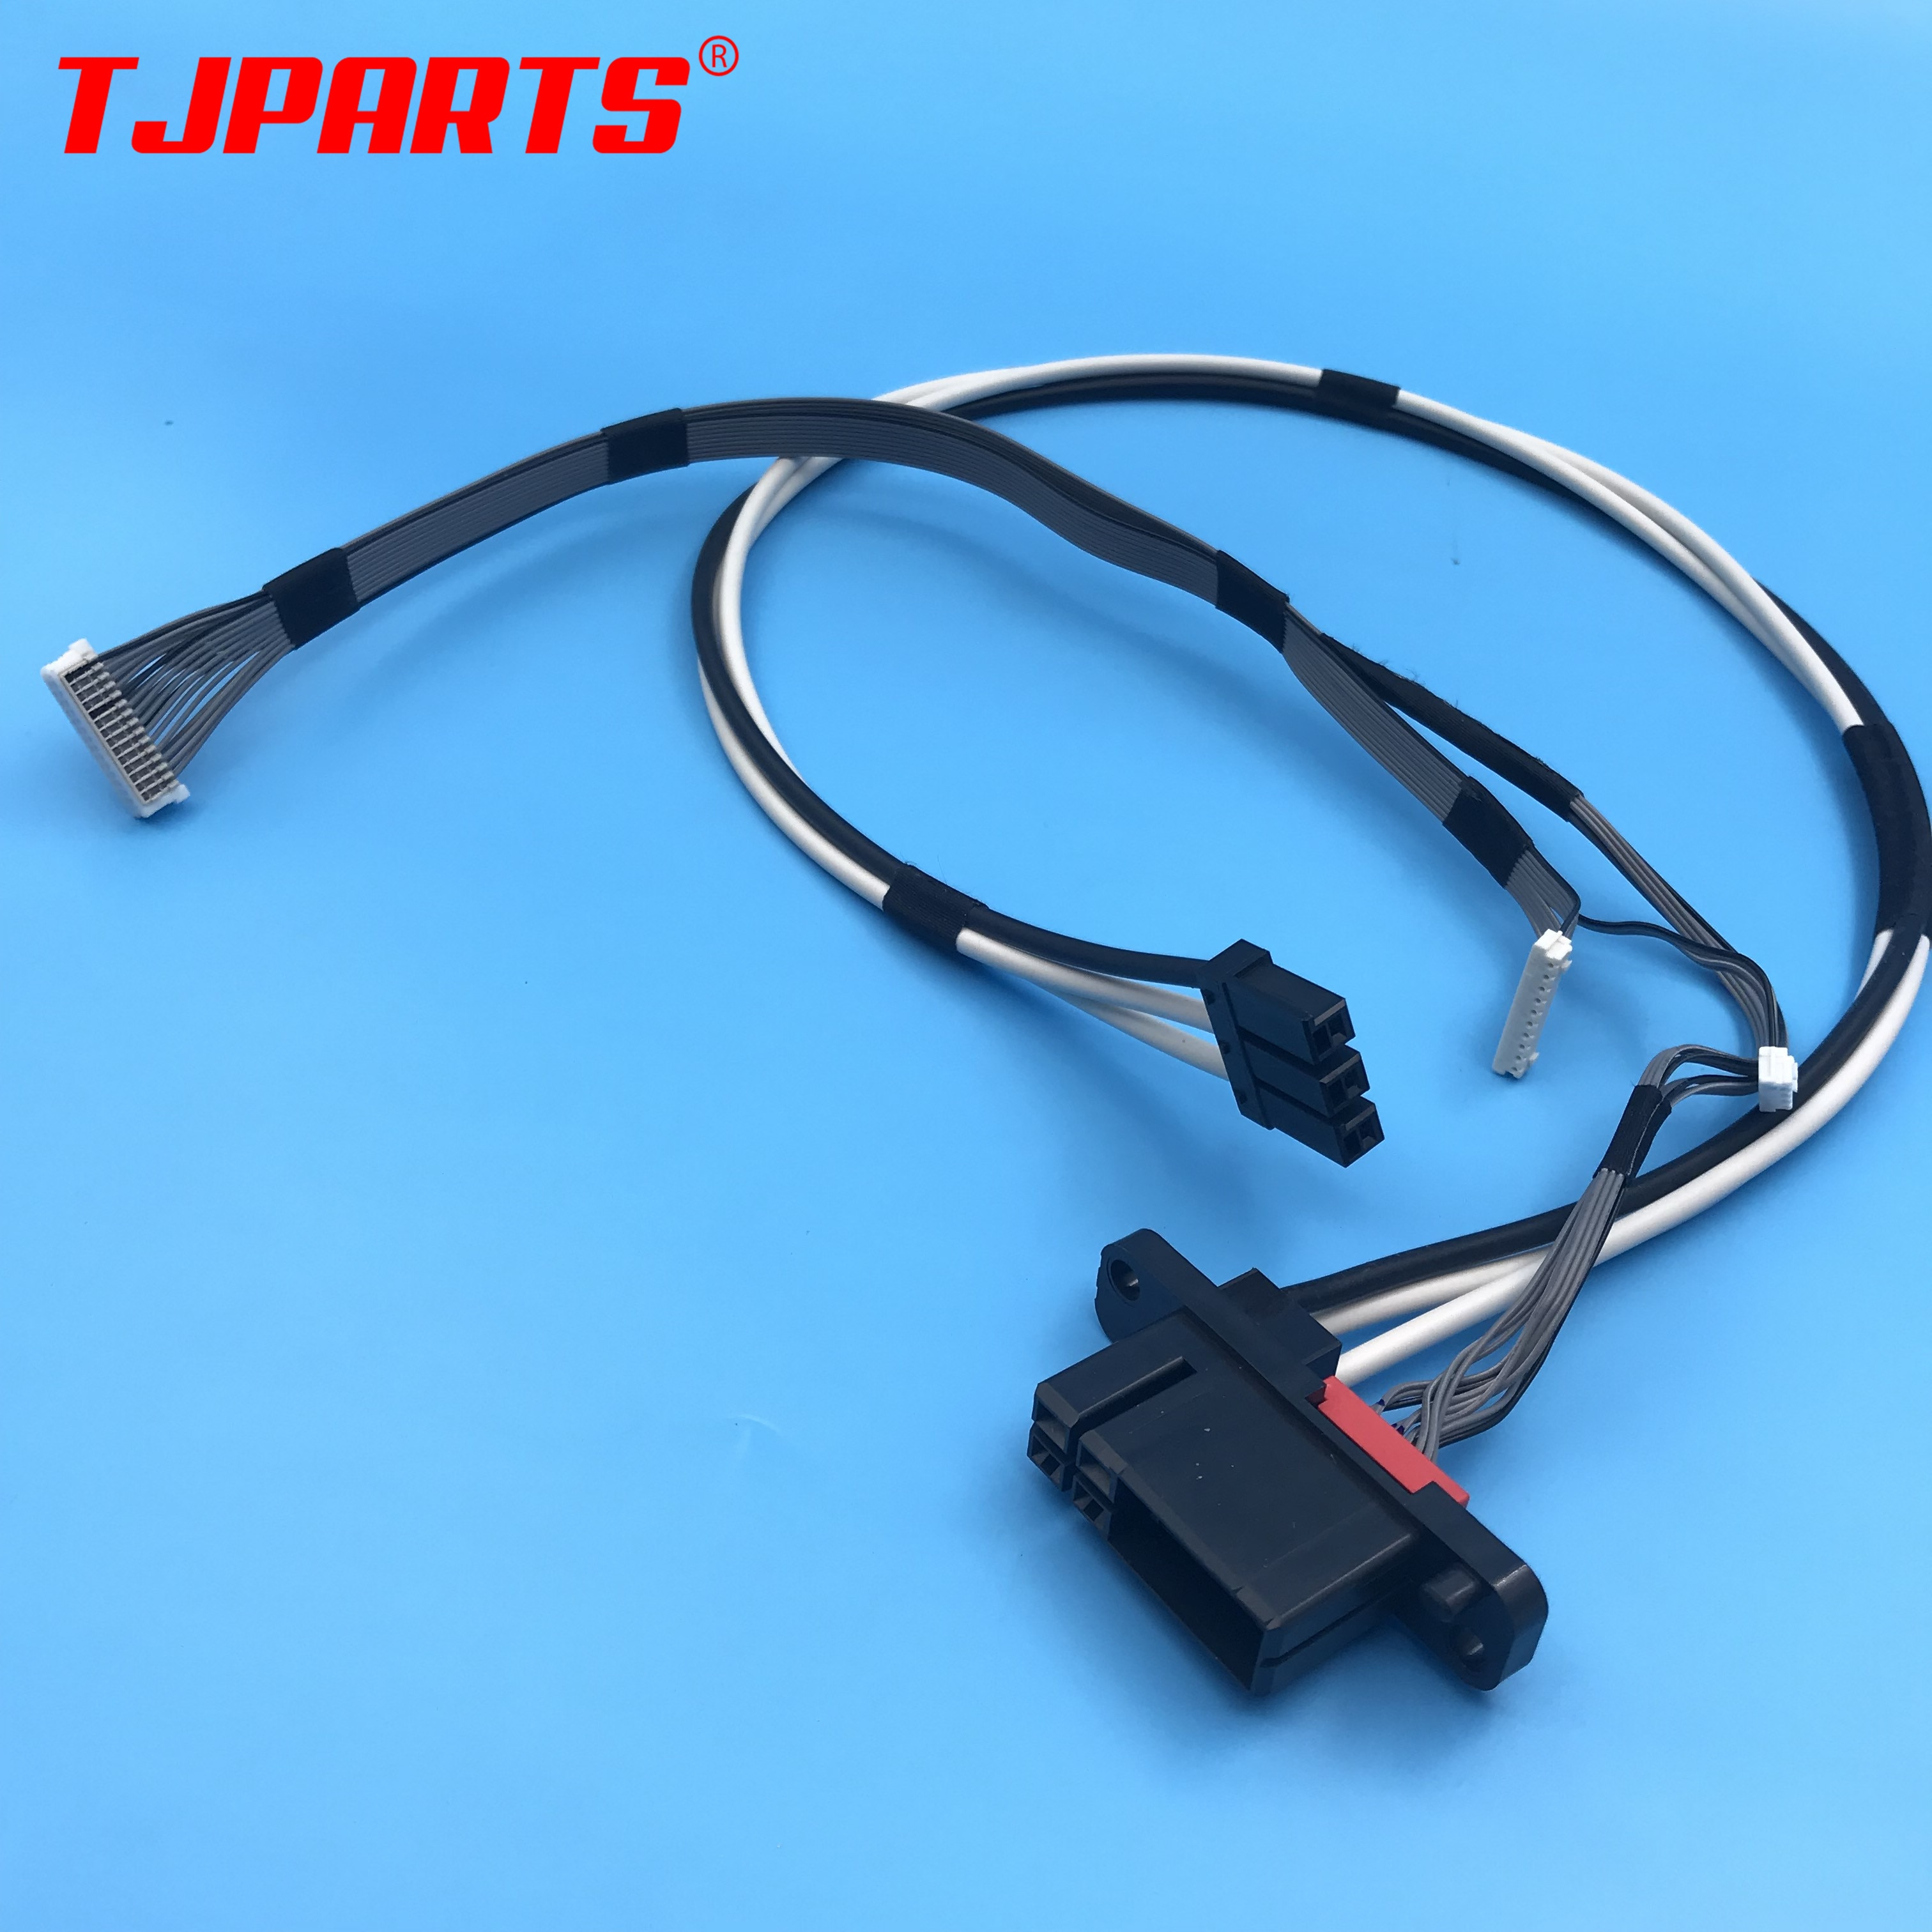 5PC X JC39-02076A arnés Fuser C Fuser Charness 625 gris/B/conexión placa Cable para SAMSUNG SL X3220 X3280 X4220 X4250 X4300